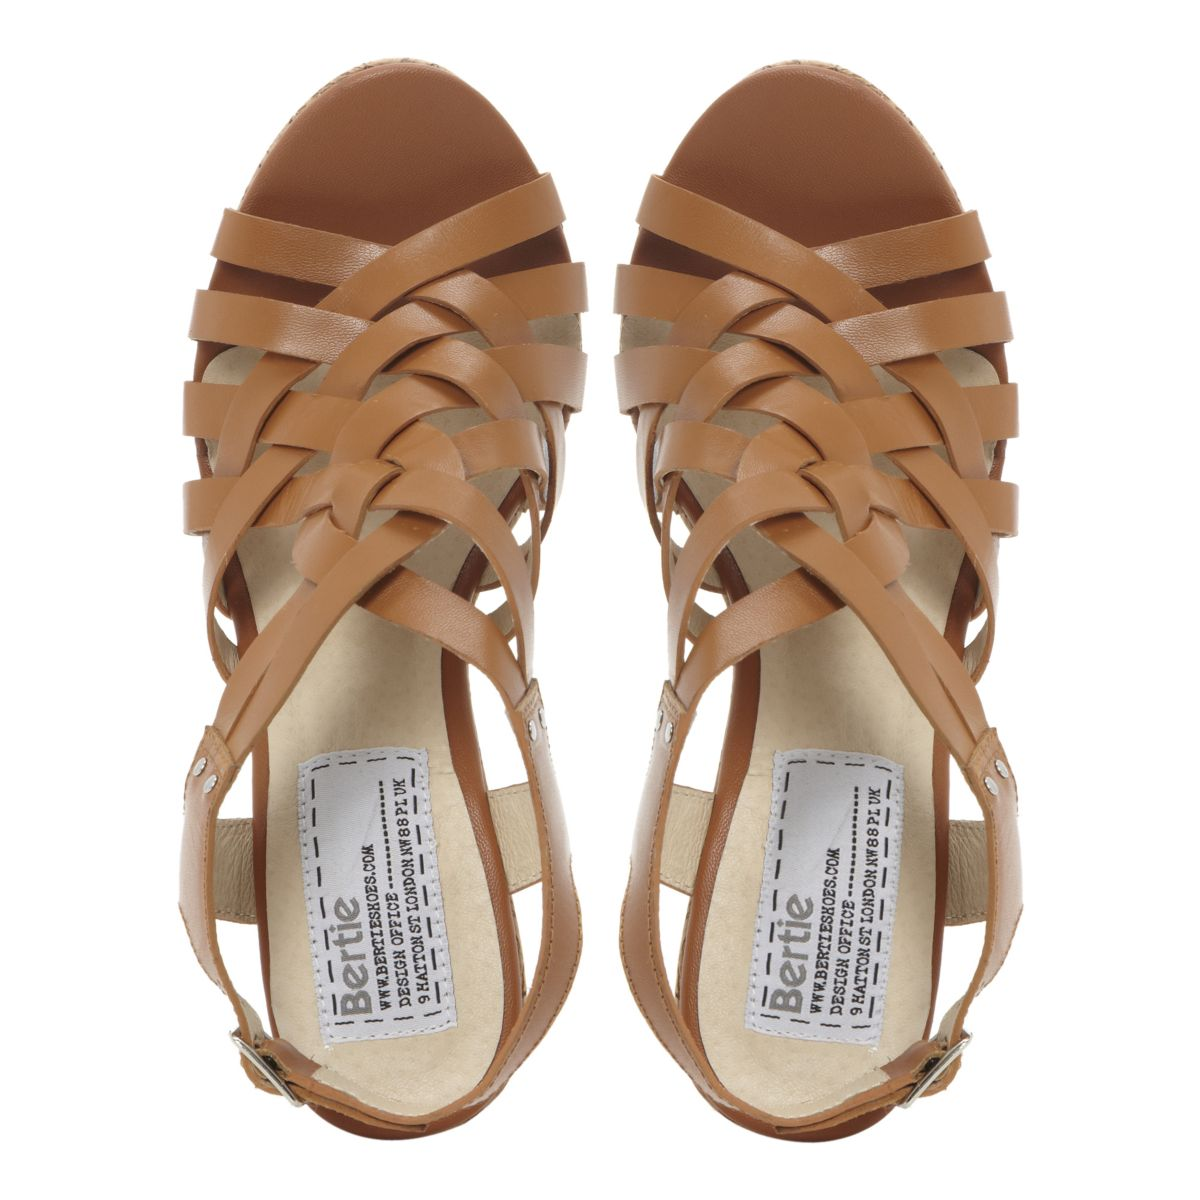 Bertie Womens Shoes Uk